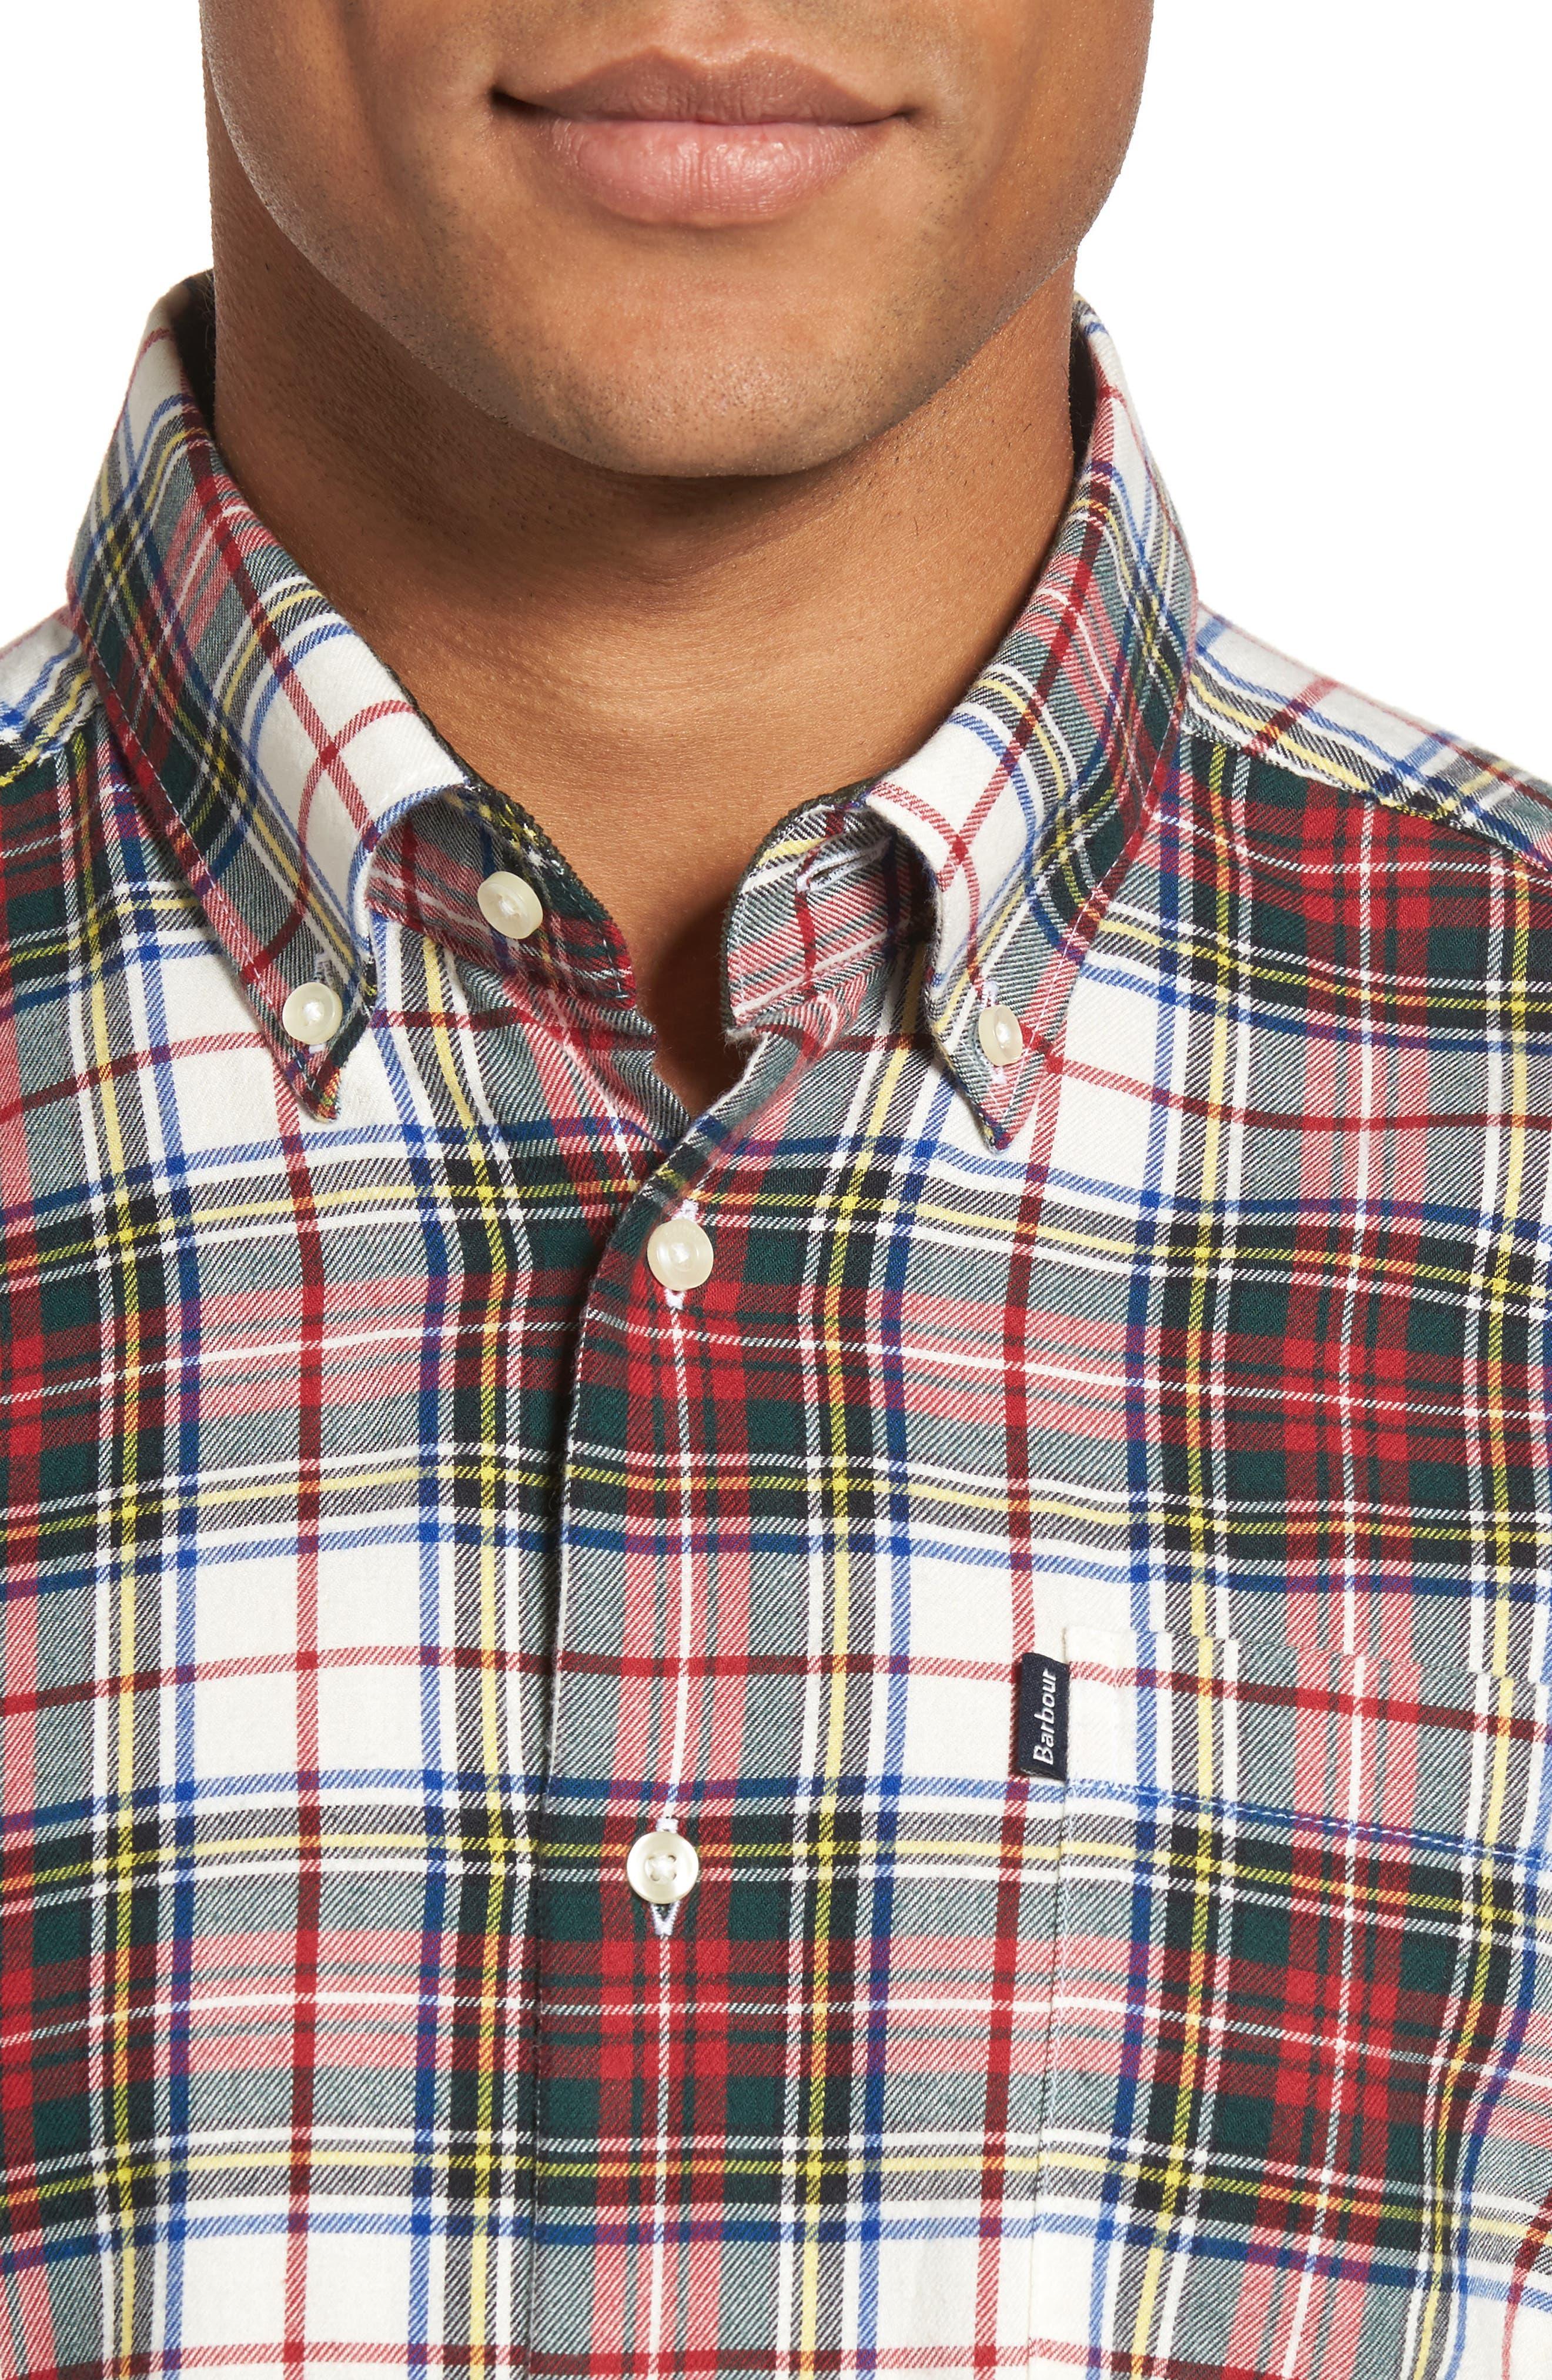 Alvin Tailored Fit Plaid Sport Shirt,                             Alternate thumbnail 4, color,                             White